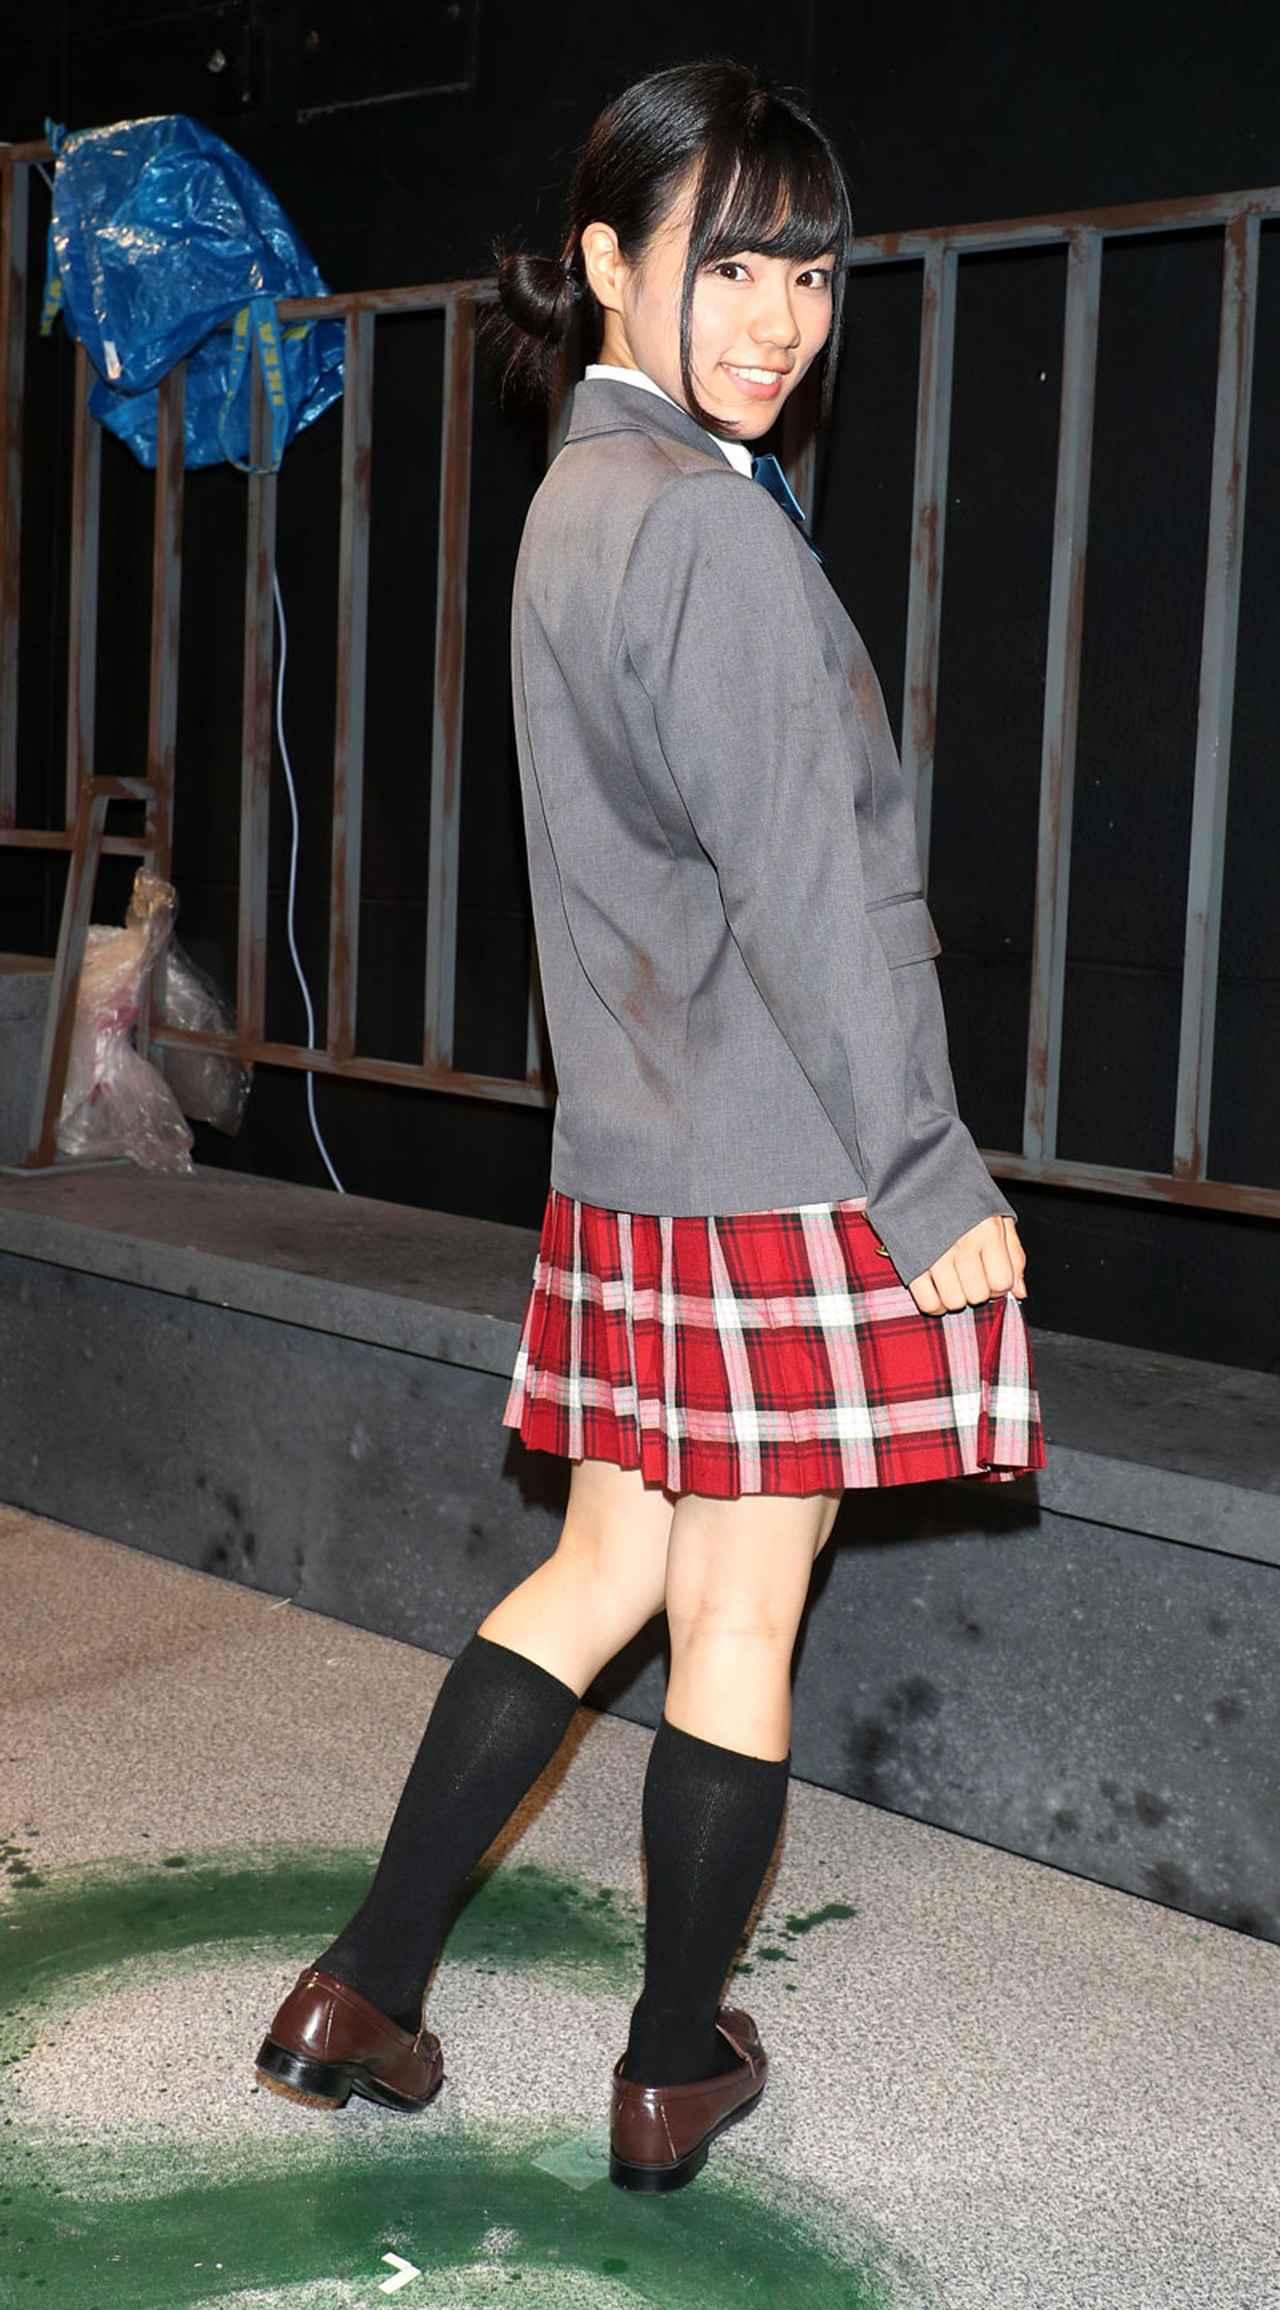 Images : 9番目の画像 - 「花岡芽佳、秋吉あき/アリスインプロジェクト最新作「最果ての星」で可憐な美少女を熱演!」のアルバム - Stereo Sound ONLINE